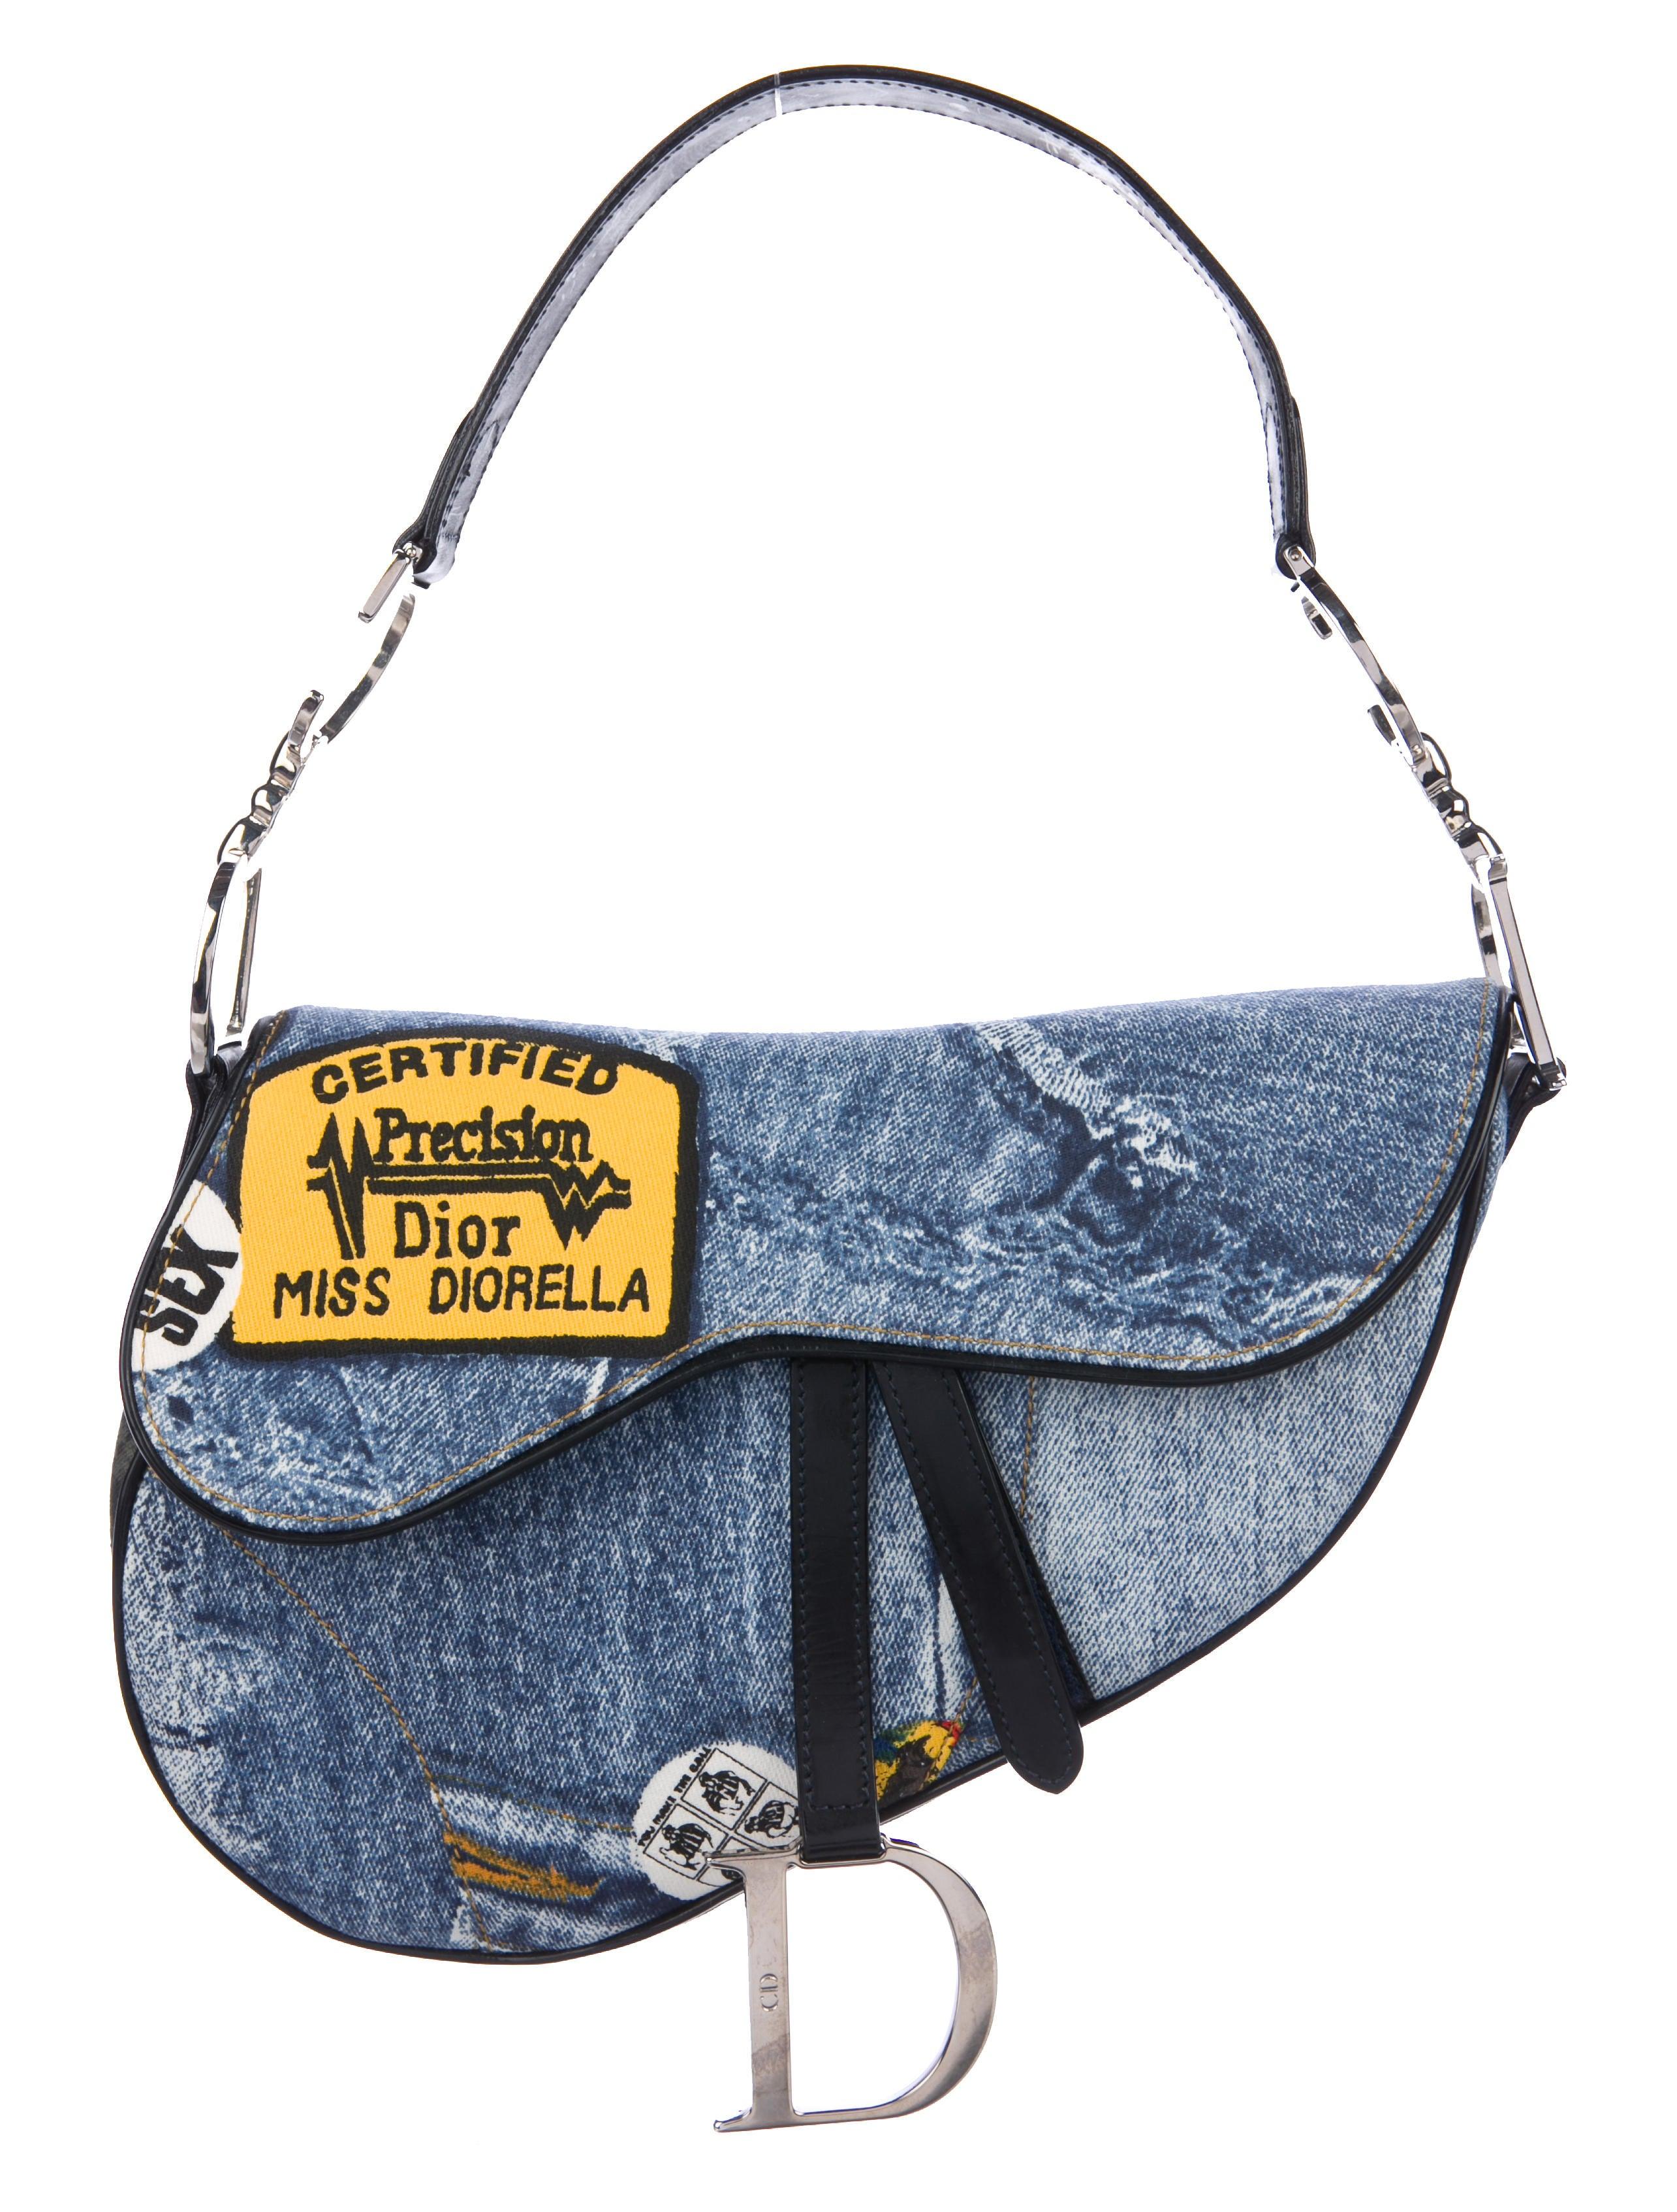 Christian Dior Miss Diorella Saddle Bag - Handbags - CHR77169  97531c611dfd9